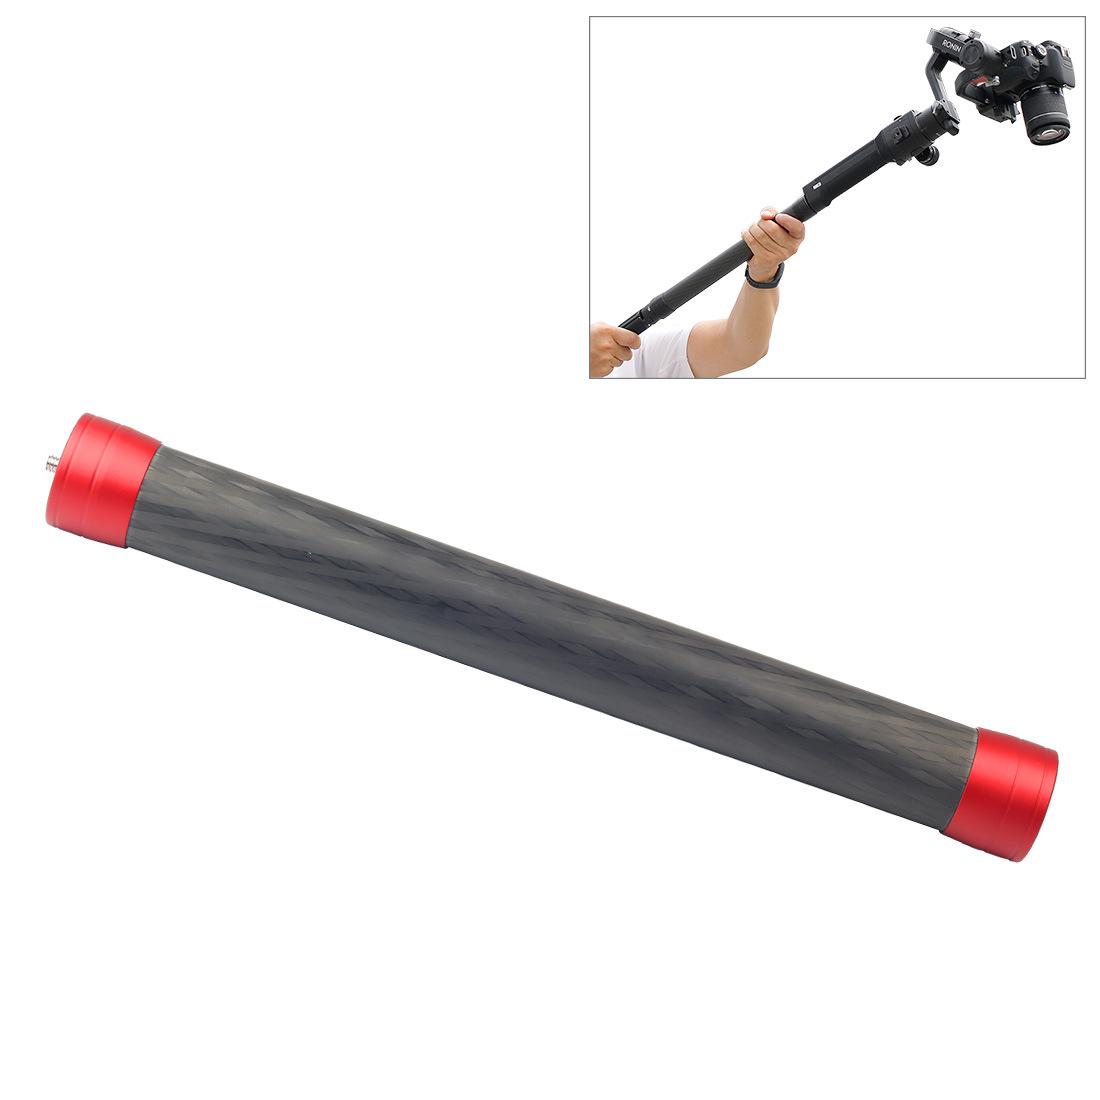 Carbon Fiber Extension Monopod Pole Rod Extendable Stick for Dji Moza Feiyu V2 Zhiyun G5 Spg Gimbal red